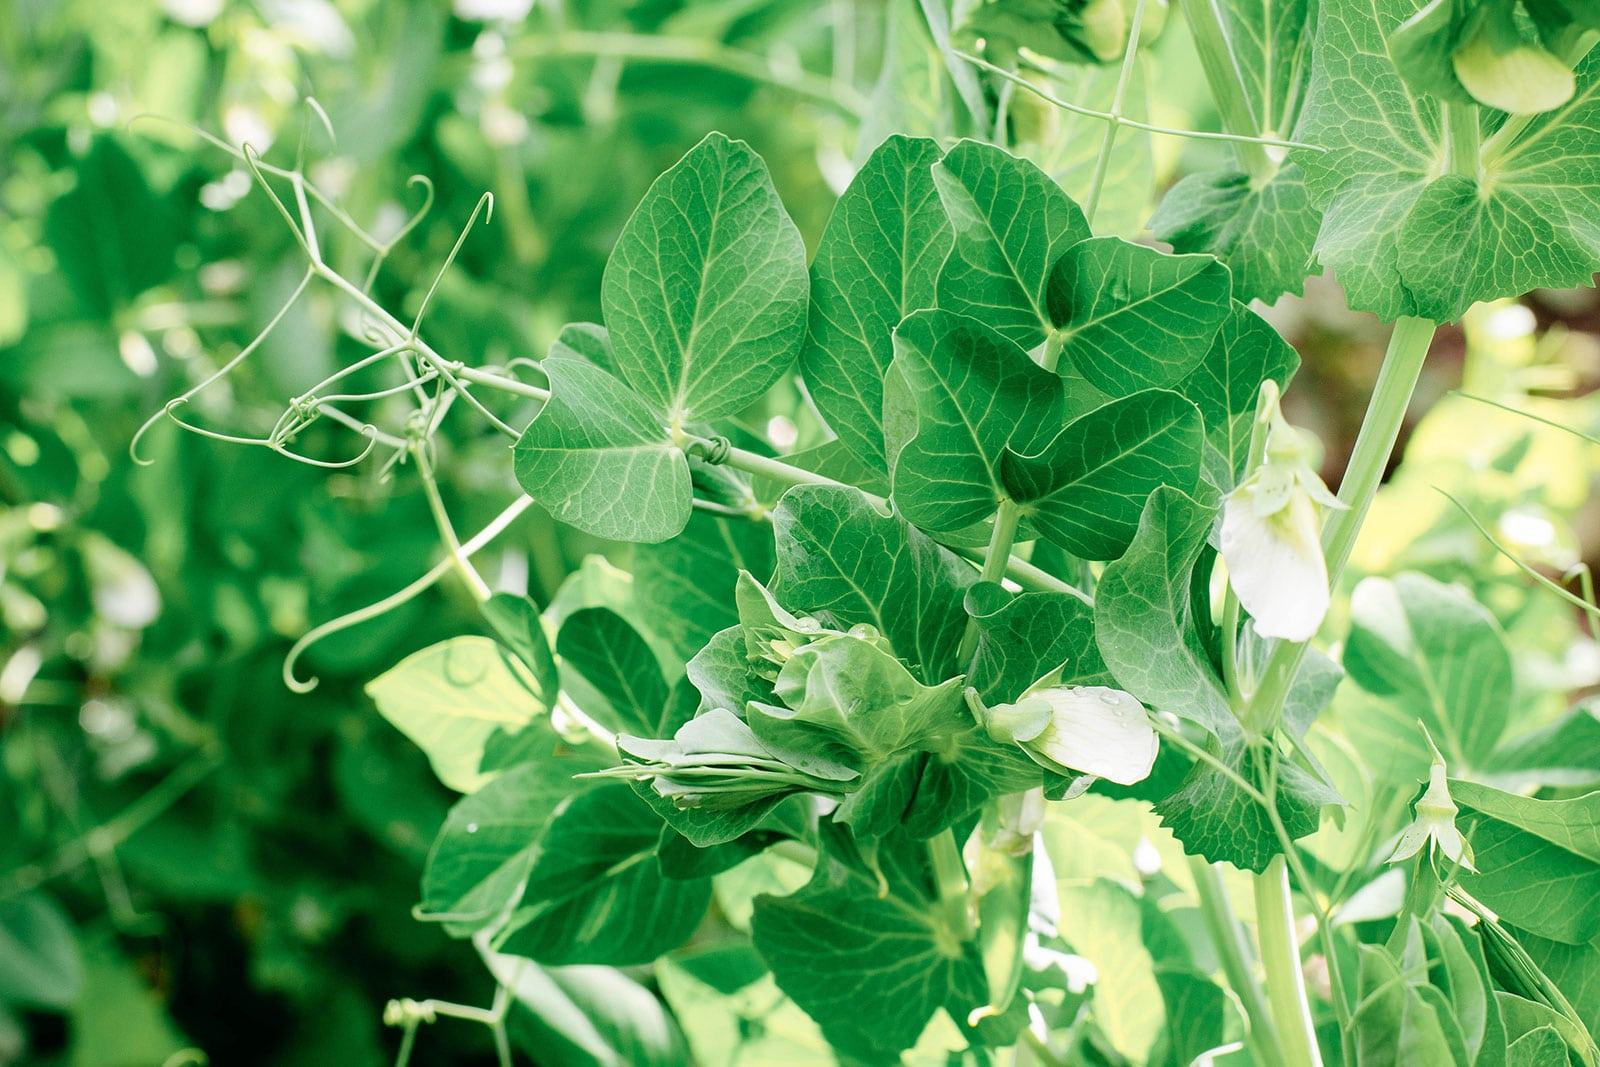 Cold-hardy Austrian winter pea plants in a garden